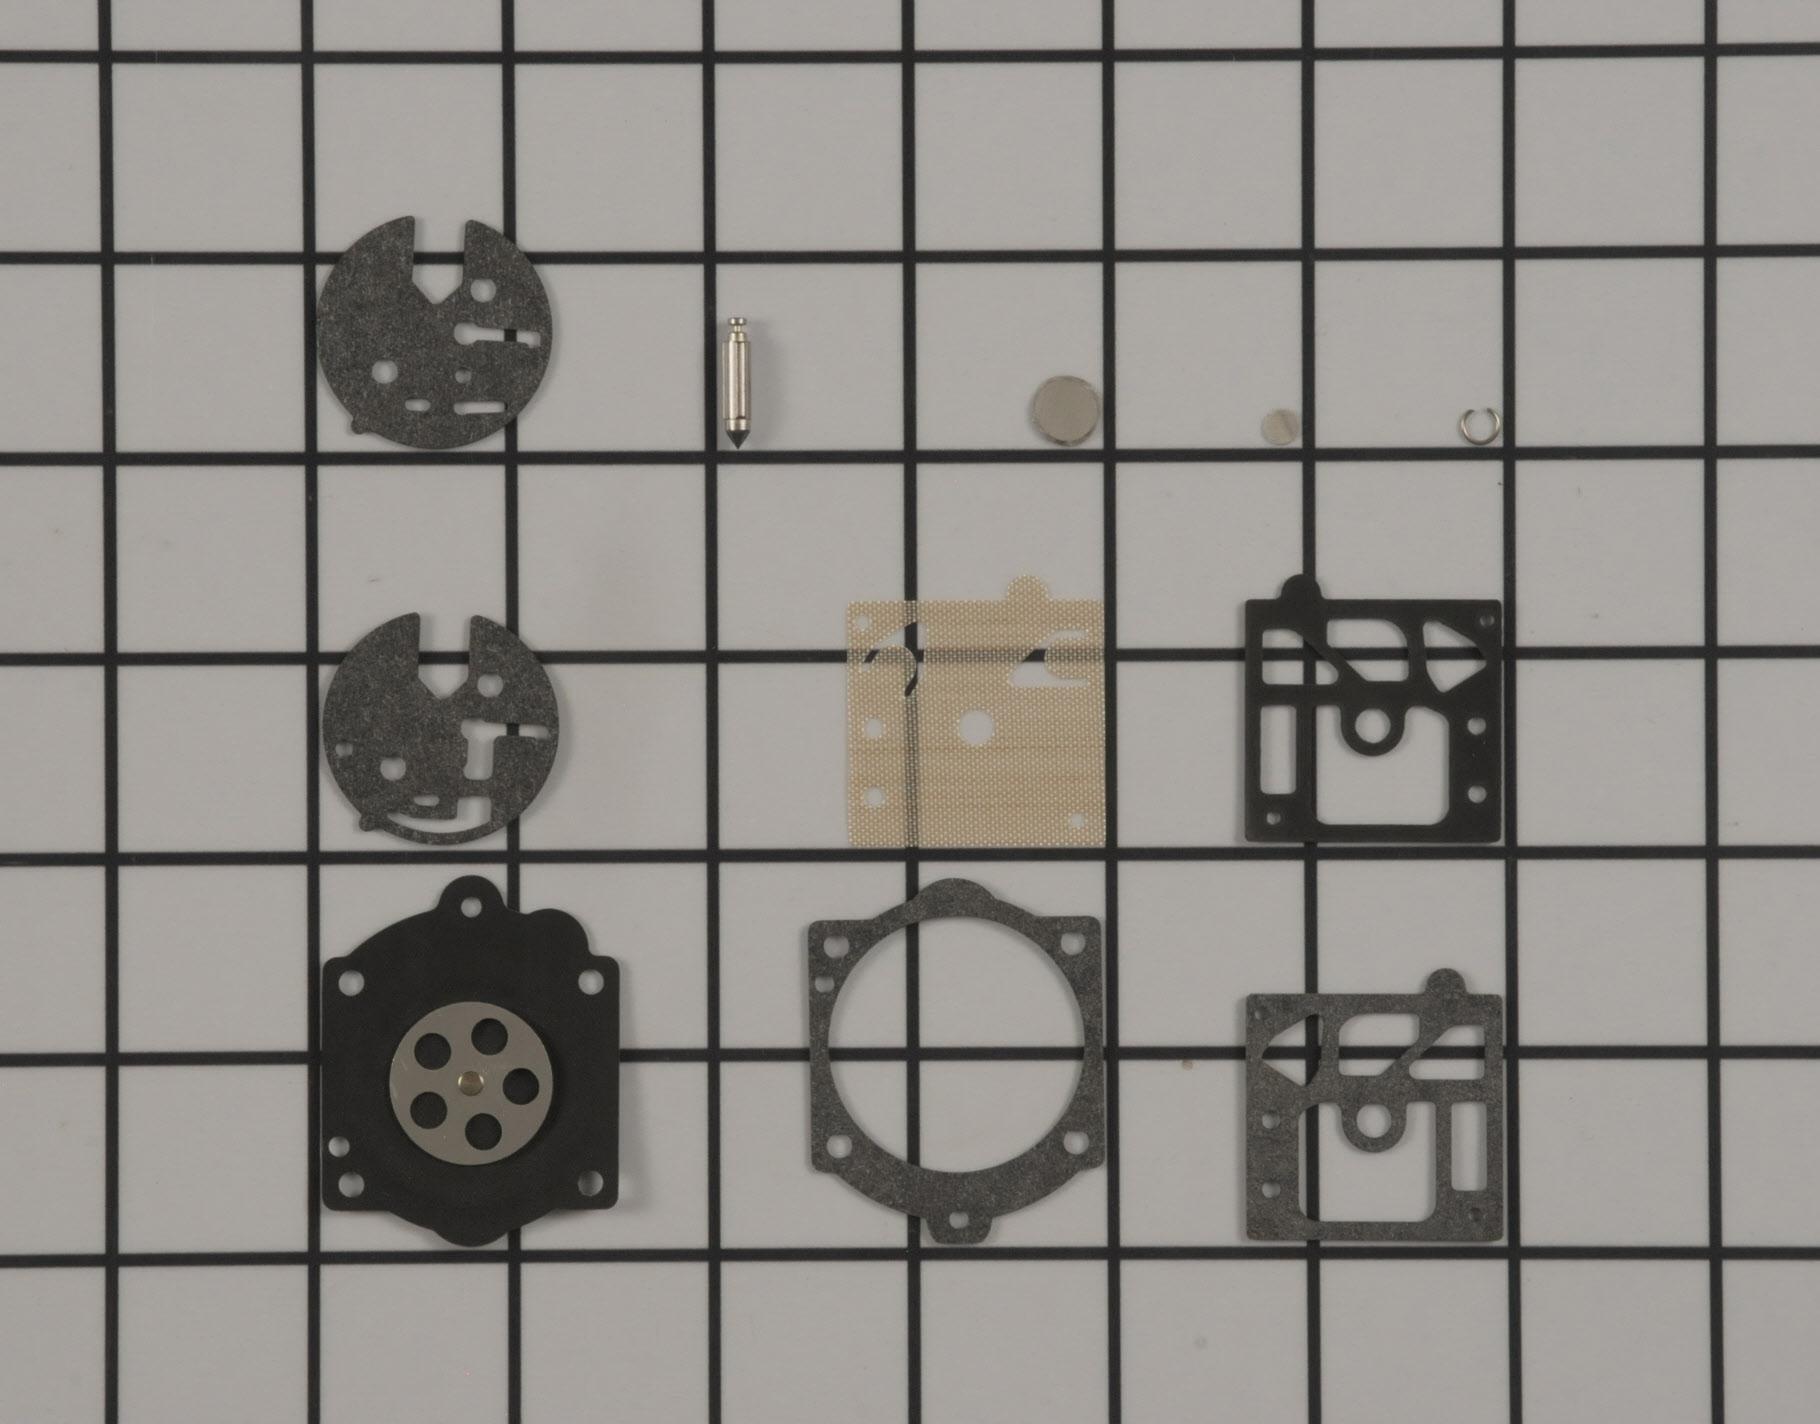 K10-HDB Walbro Small Engine Part -Carburetor Repair Kit